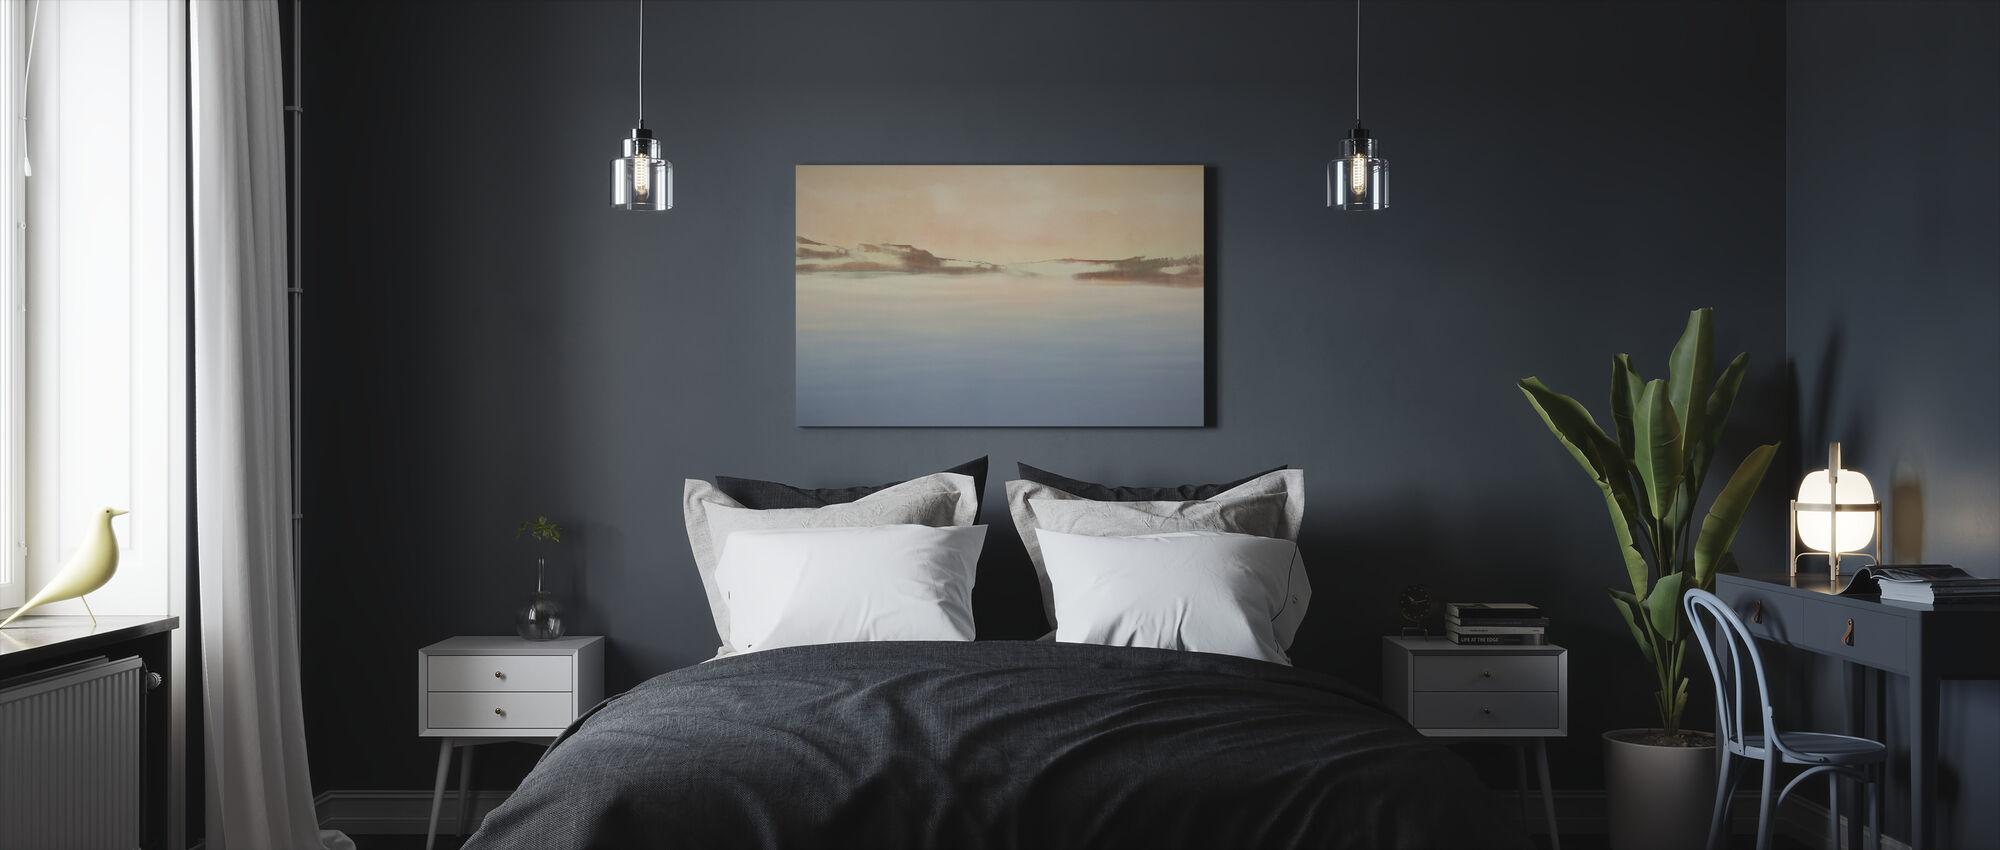 Dreamy Light II - Canvas print - Bedroom